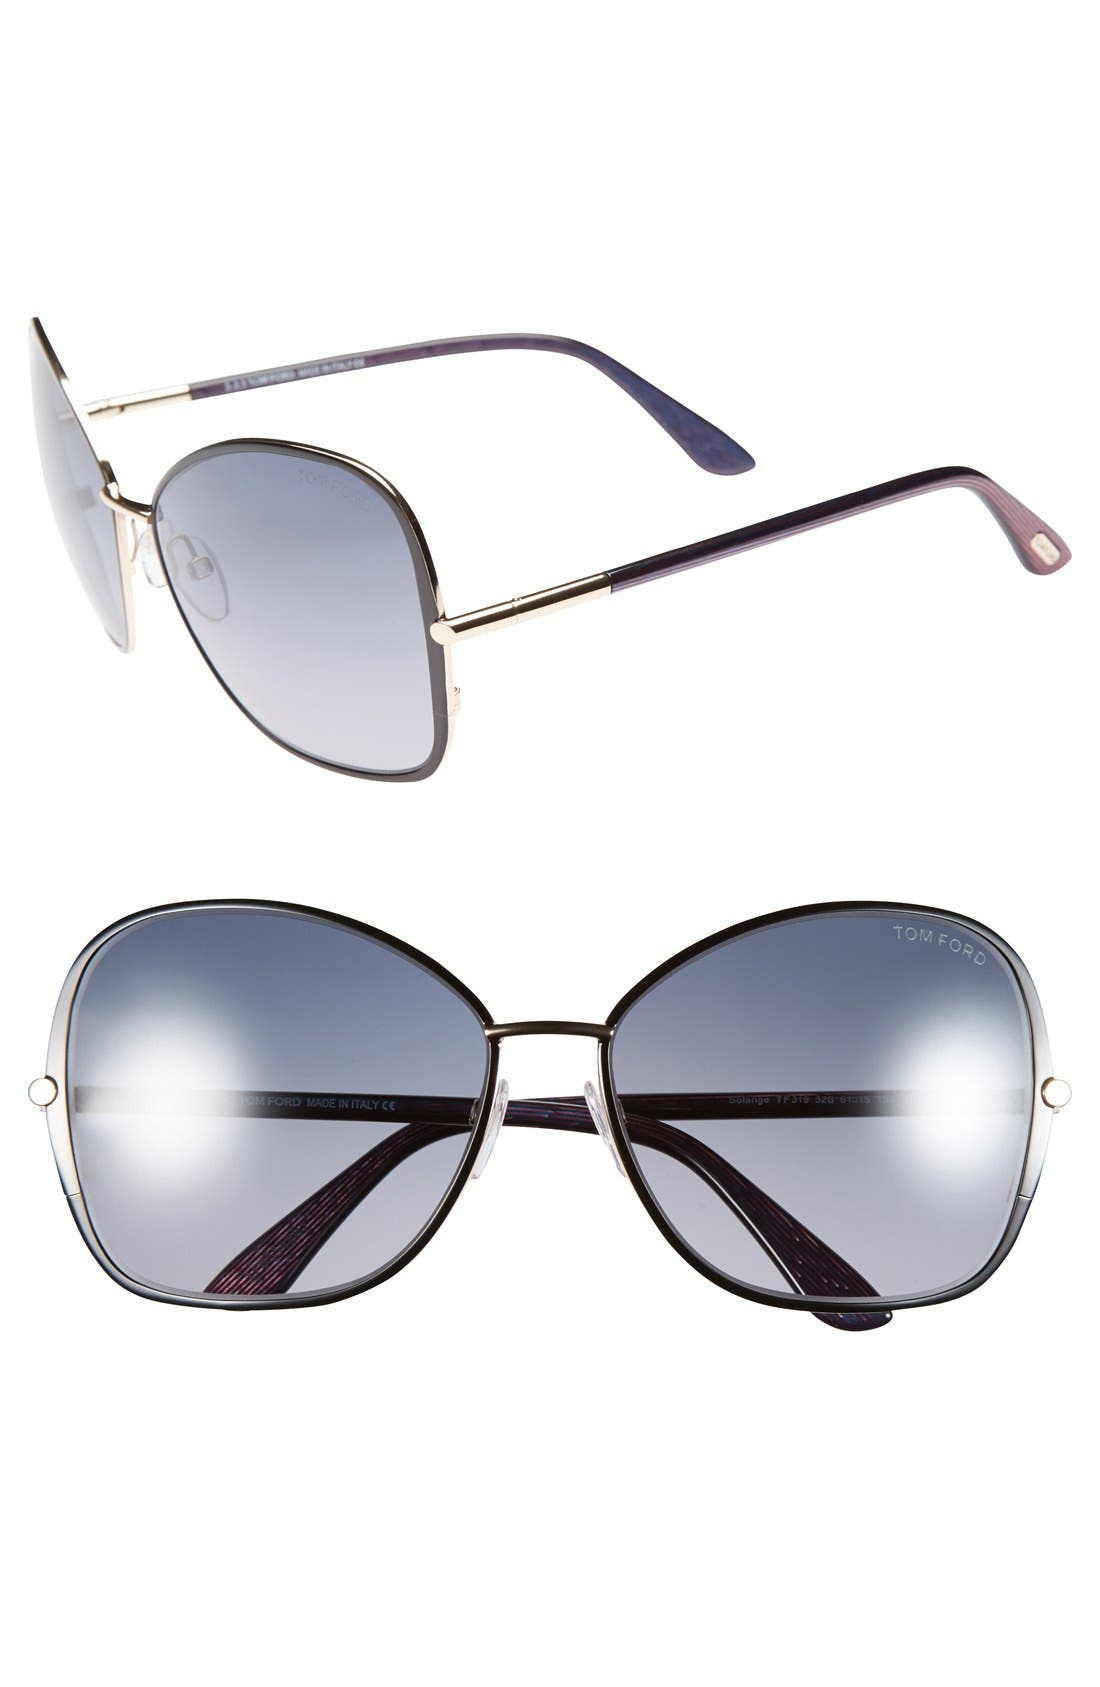 Alternate Image 1 Selected - Tom Ford 'Solange' 61mm Sunglasses (Regular Retail Price: $405.00)